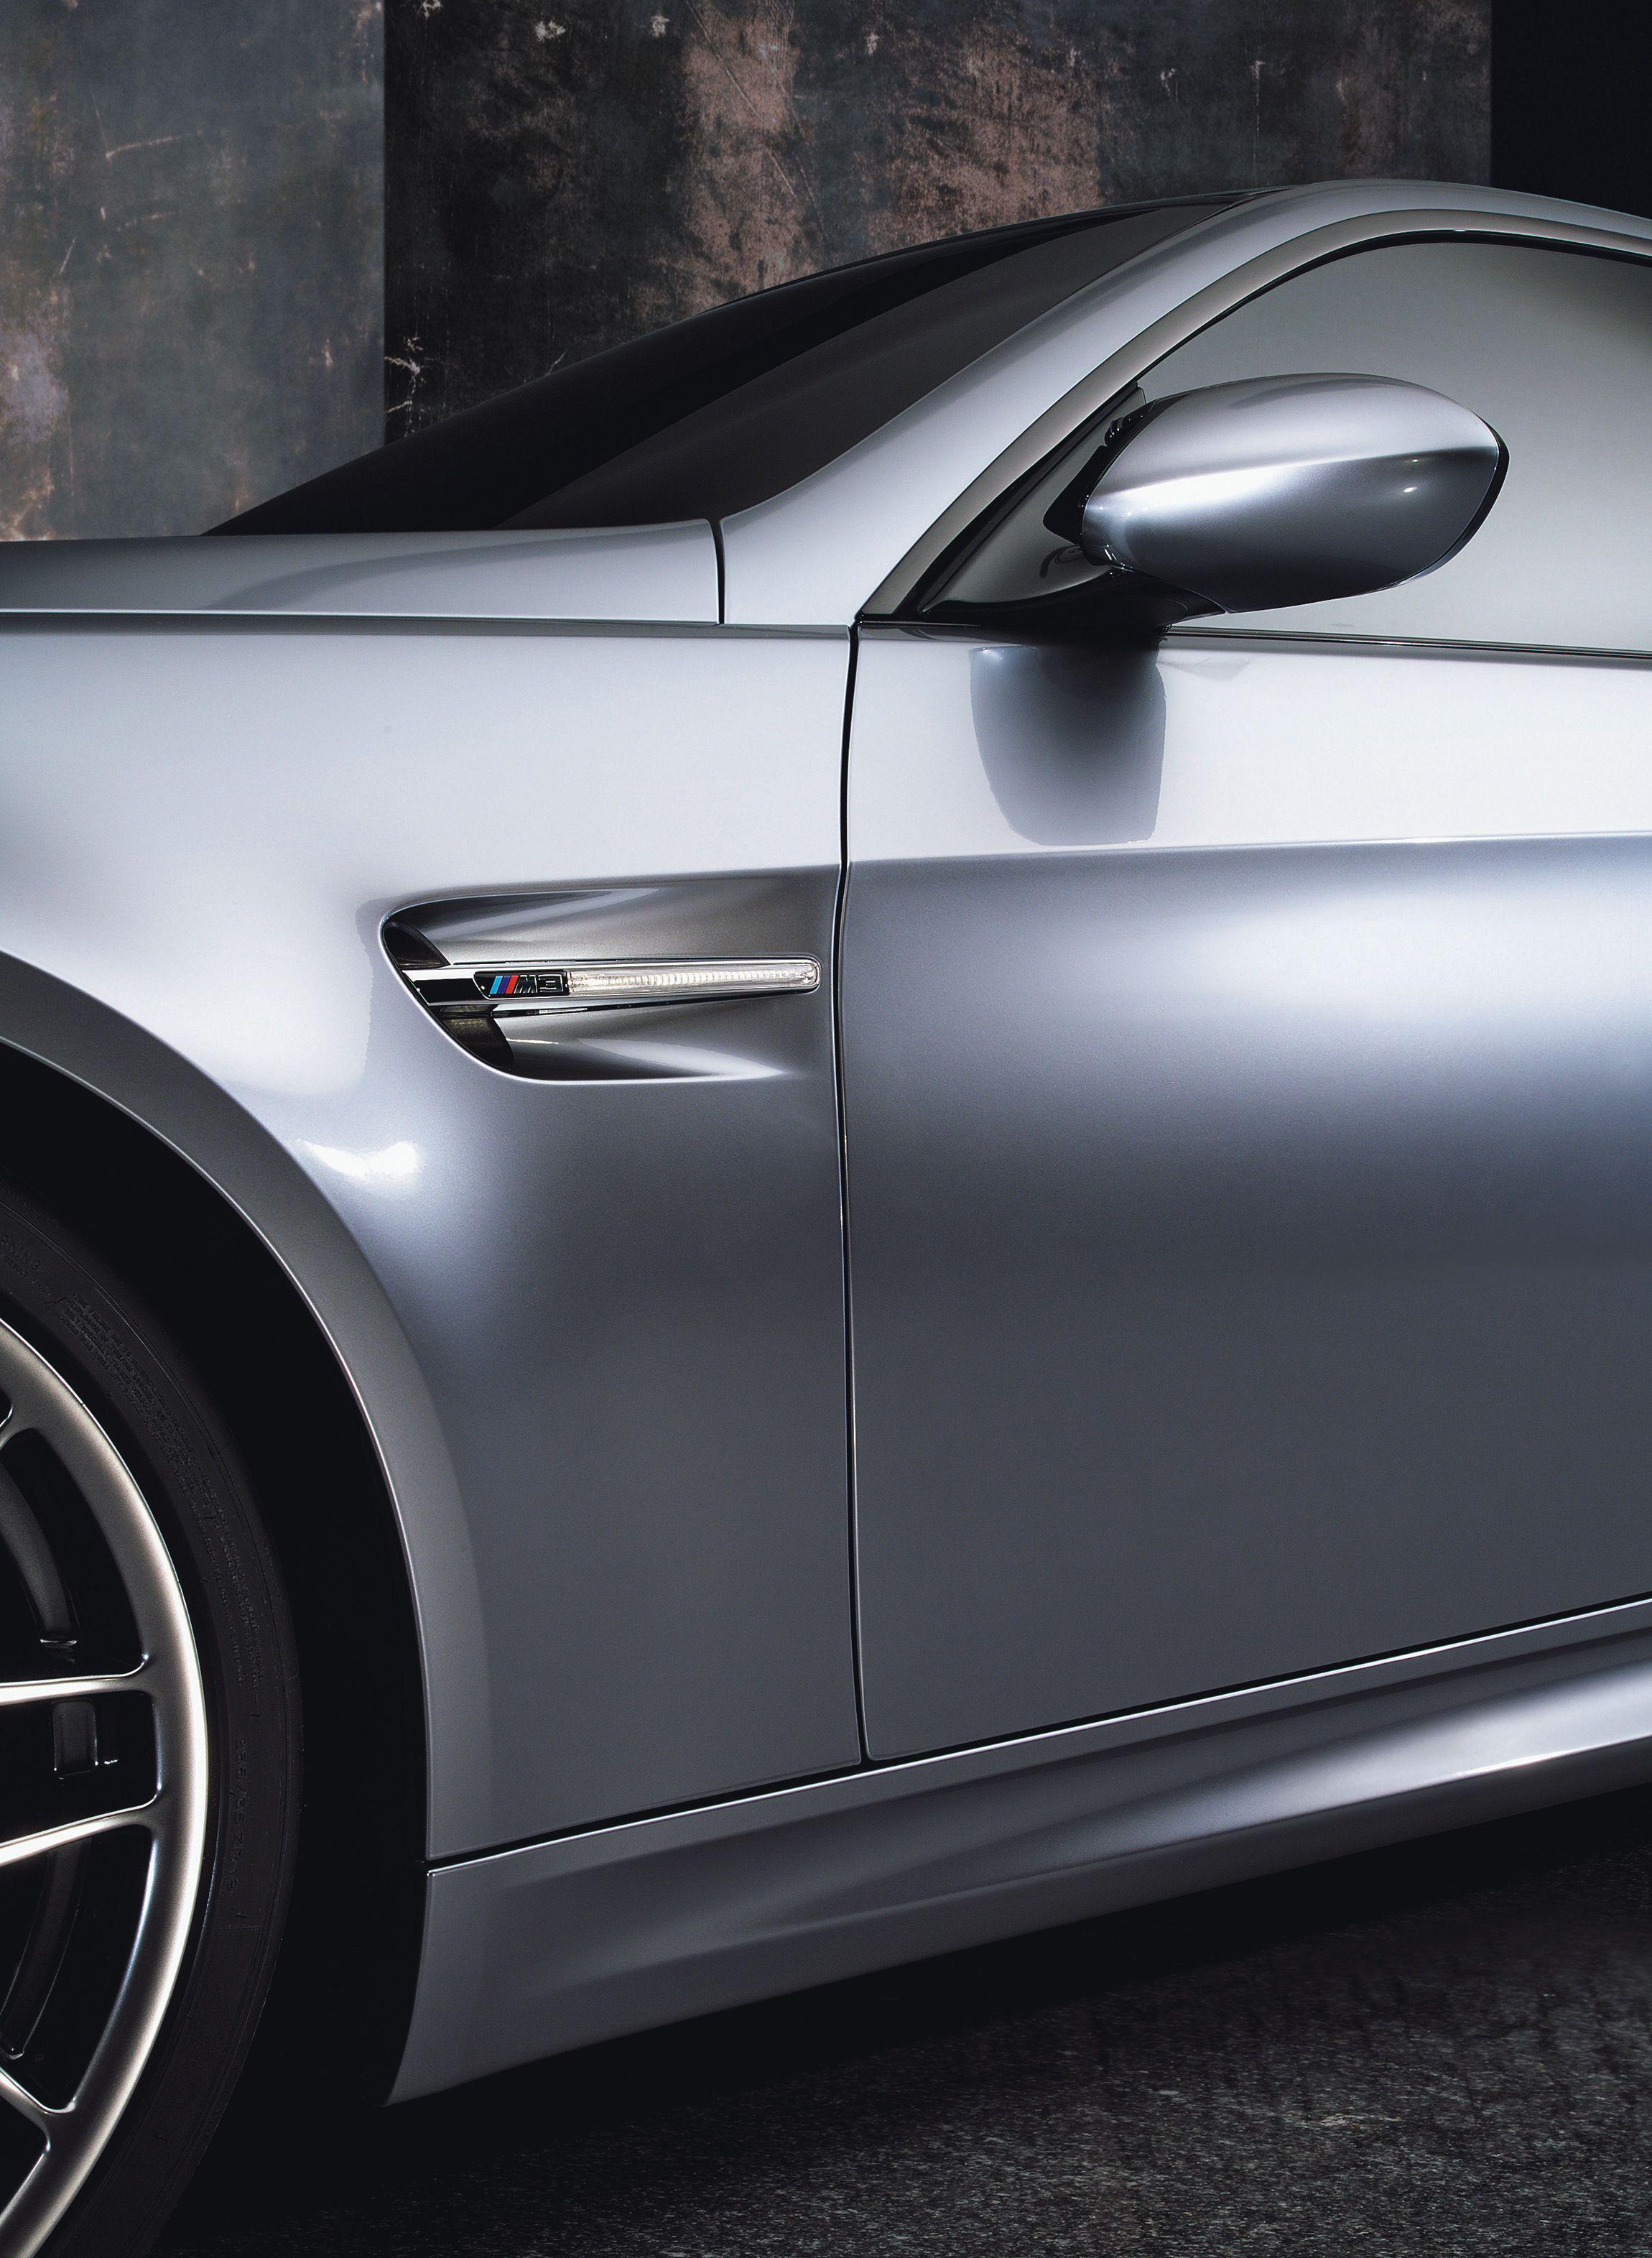 2007 BMW M3 concept | BMW concepts | Pinterest | BMW M3 and BMW